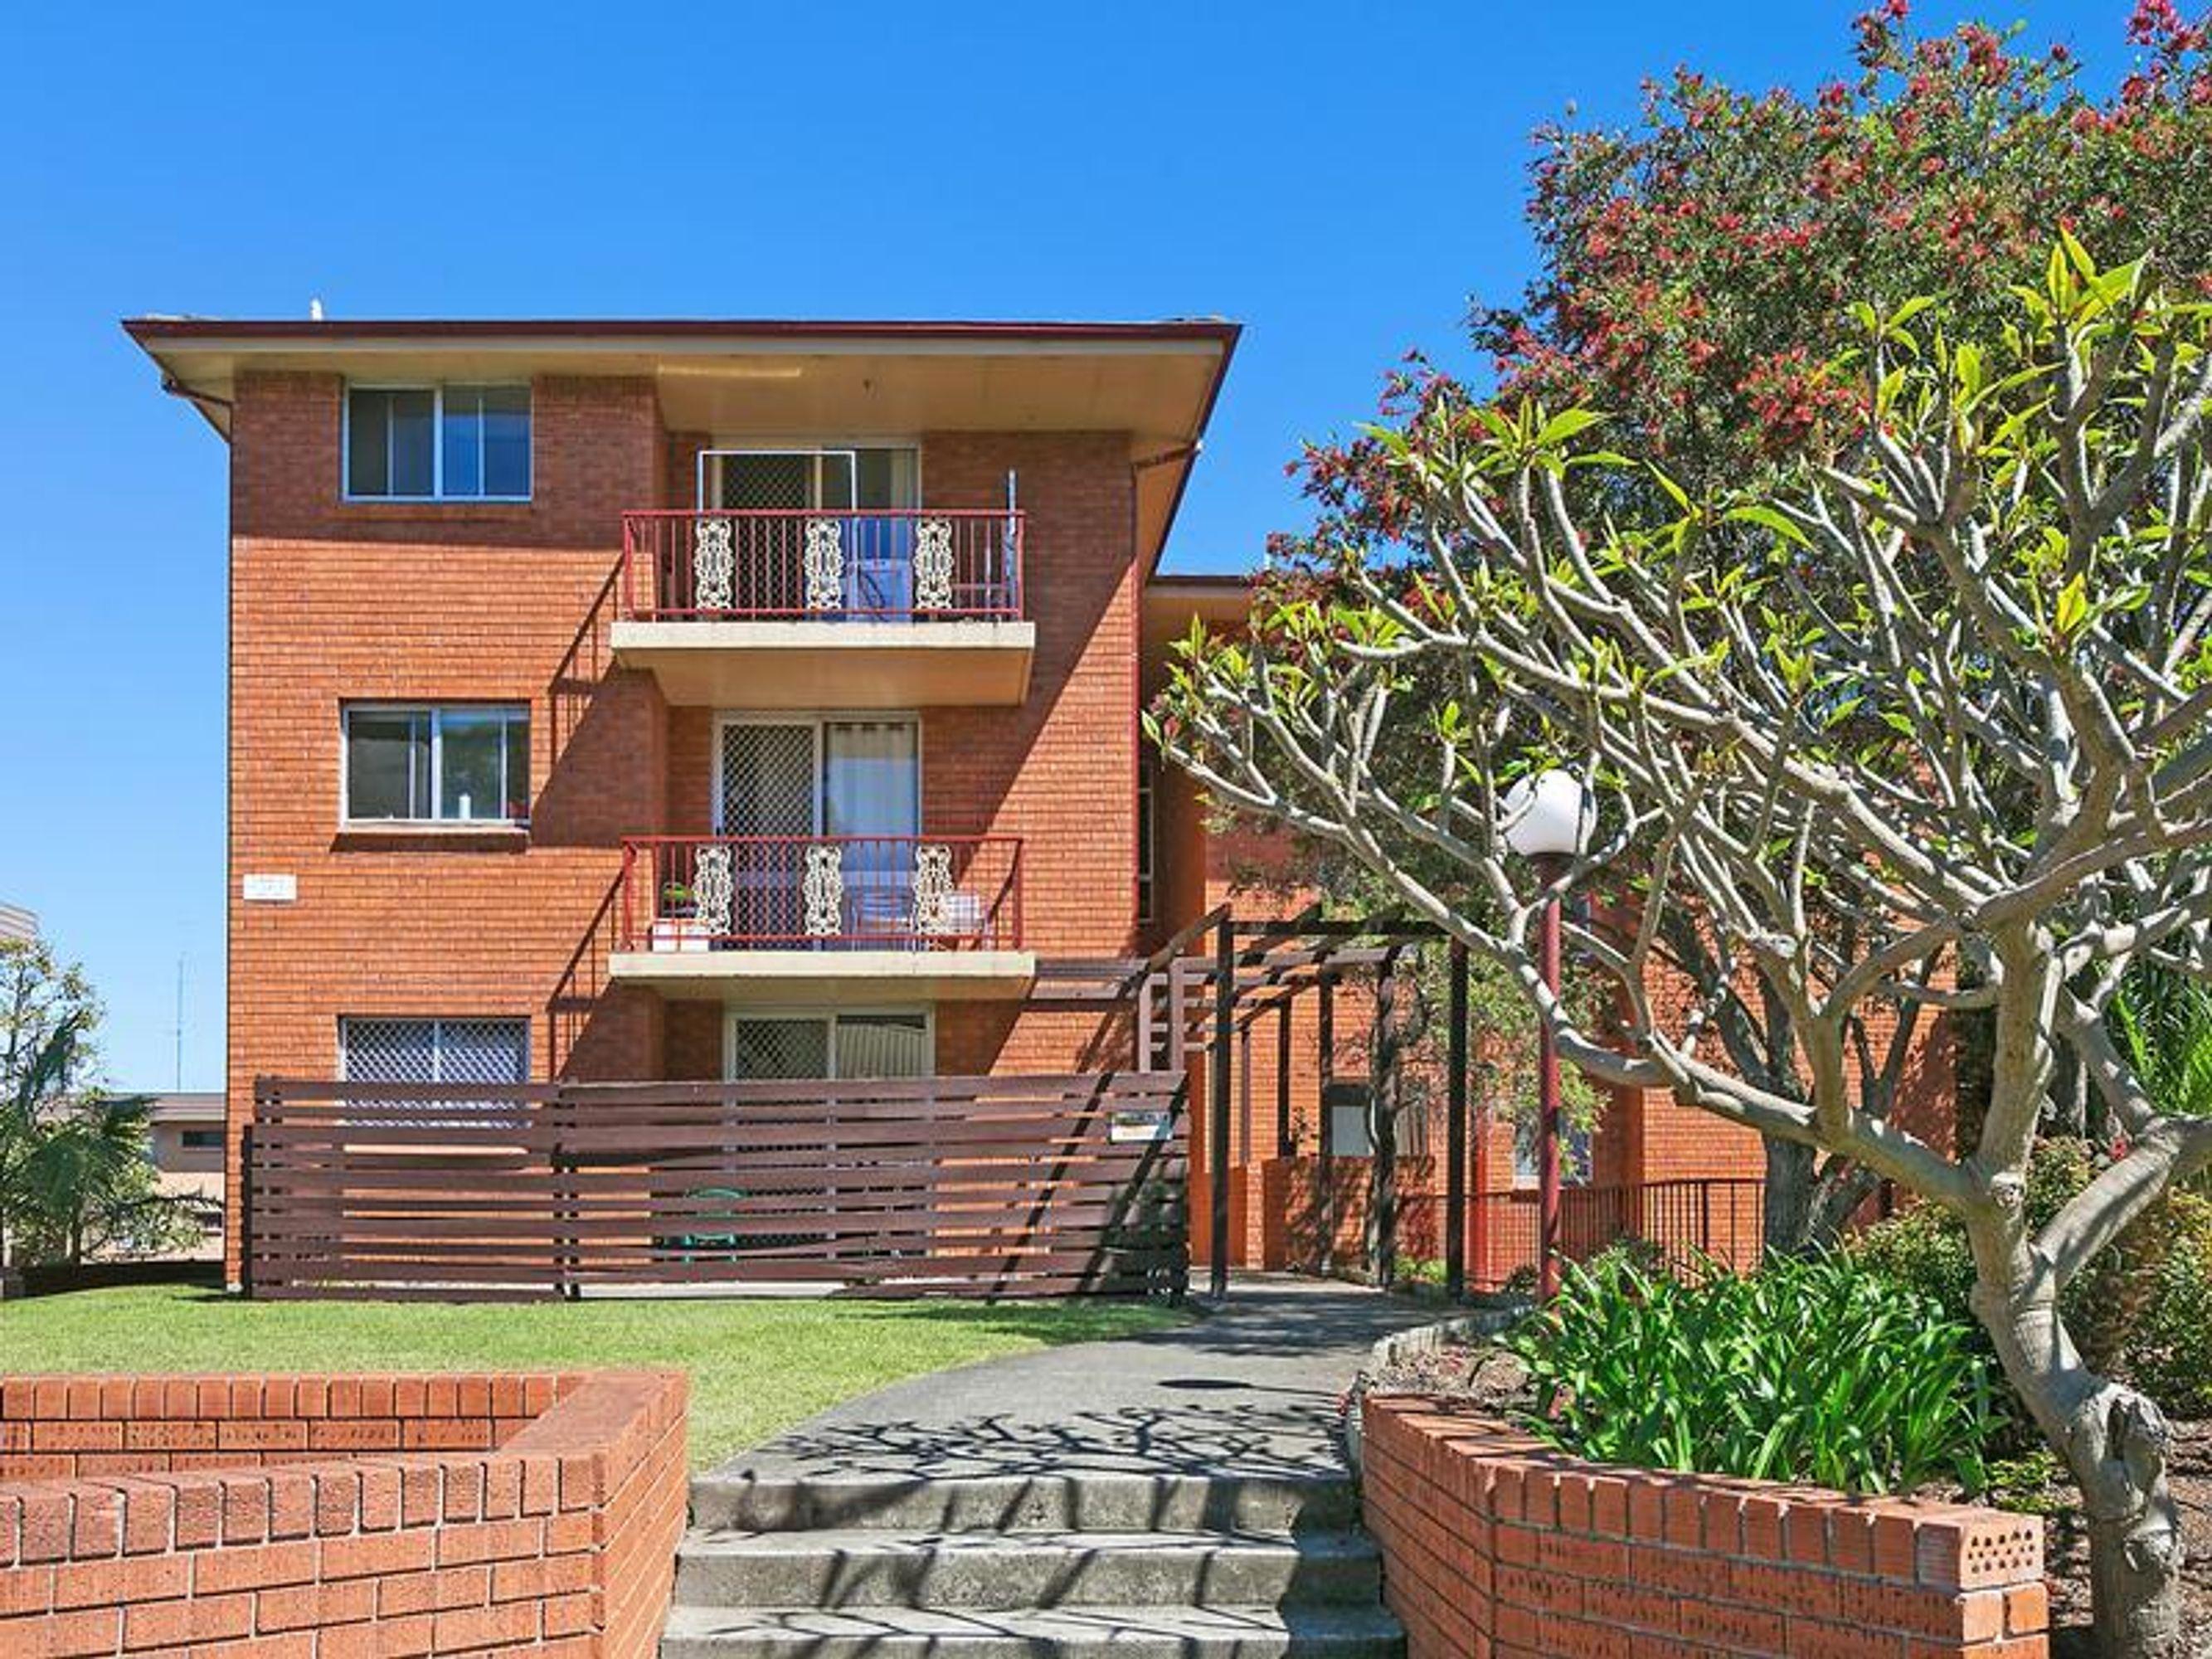 11/46-48 Keira Street, Wollongong, NSW 2500